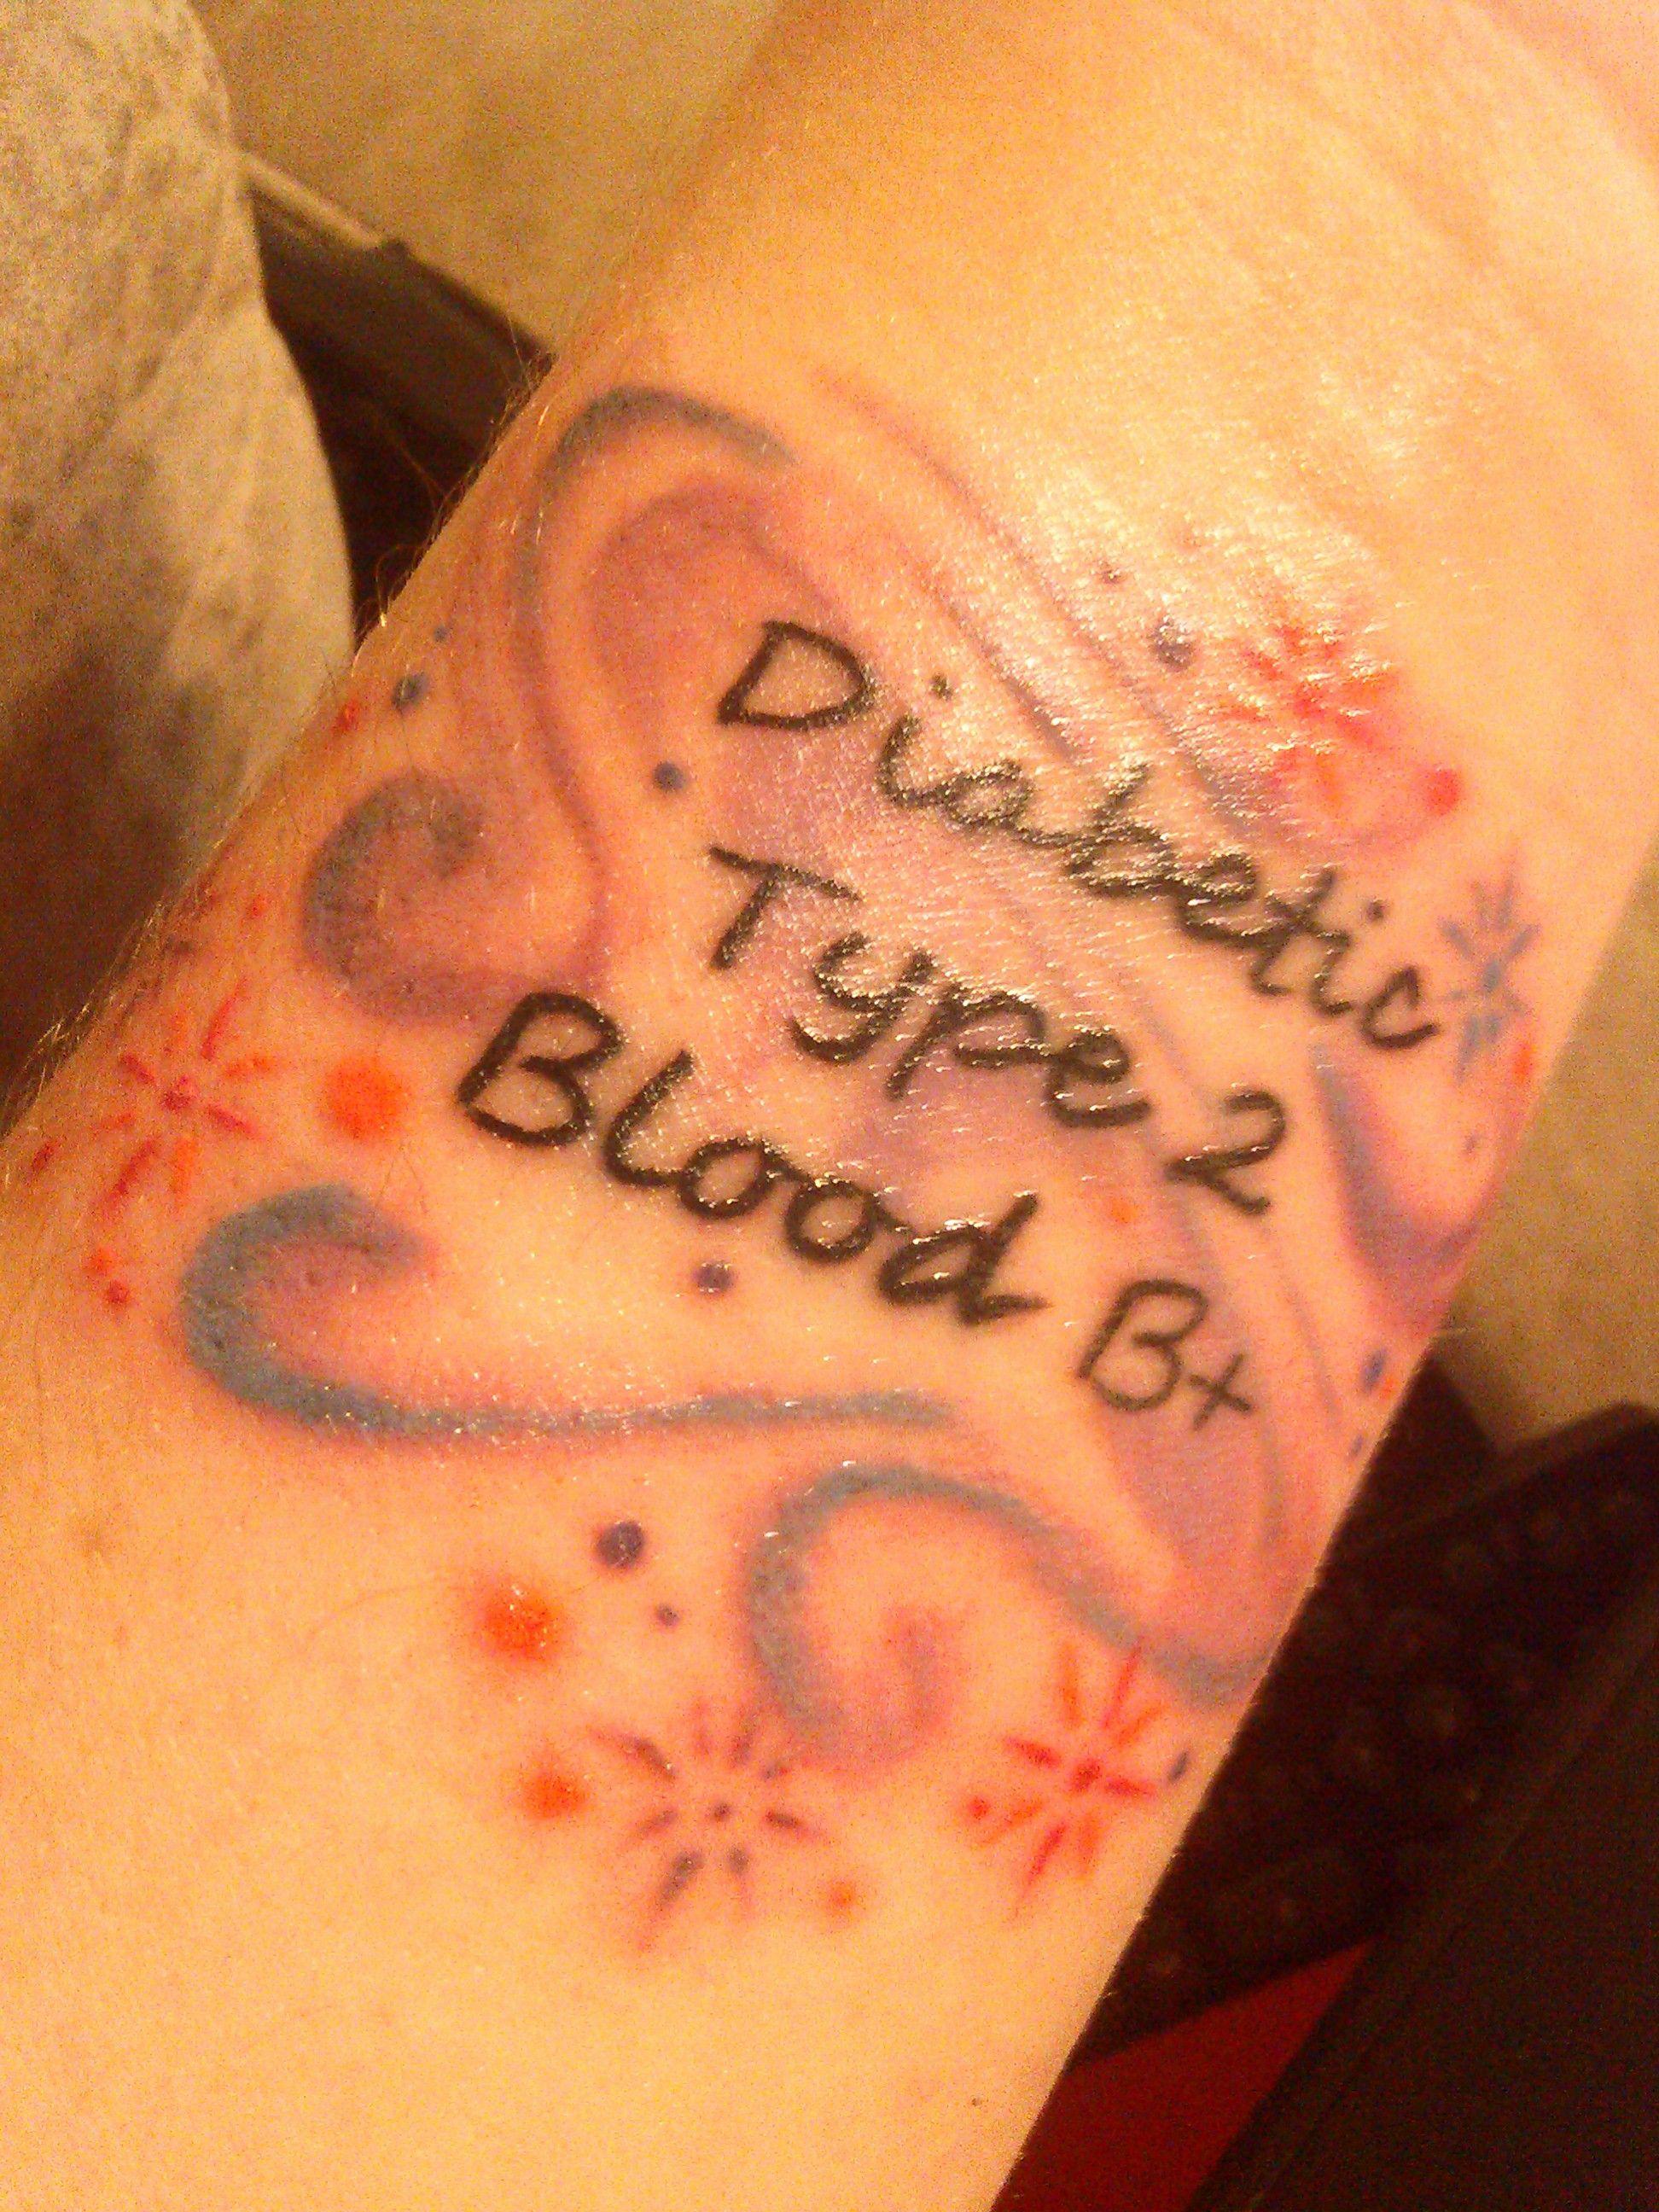 my new medic alert tattoo my style pinterest tattoo medical alert tattoo and diabetes tattoo. Black Bedroom Furniture Sets. Home Design Ideas